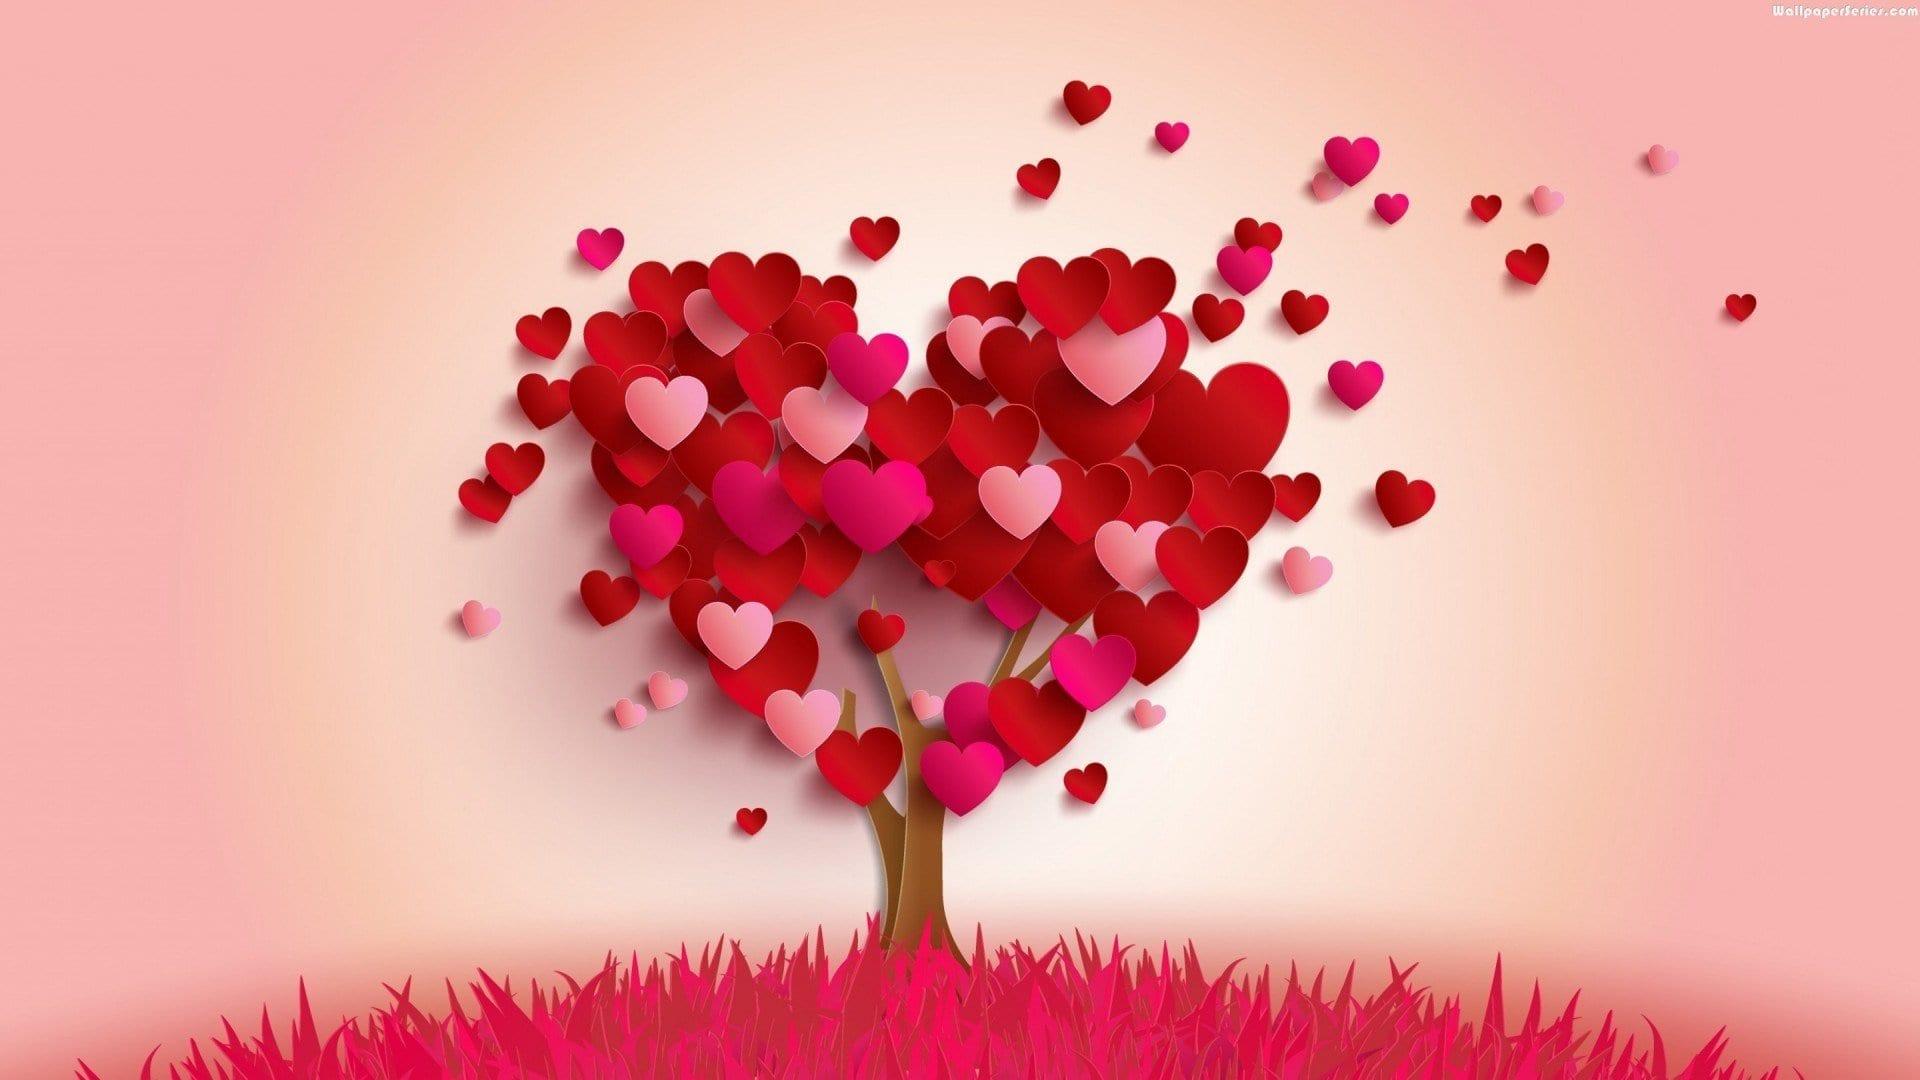 Marketing ideas for Valentine